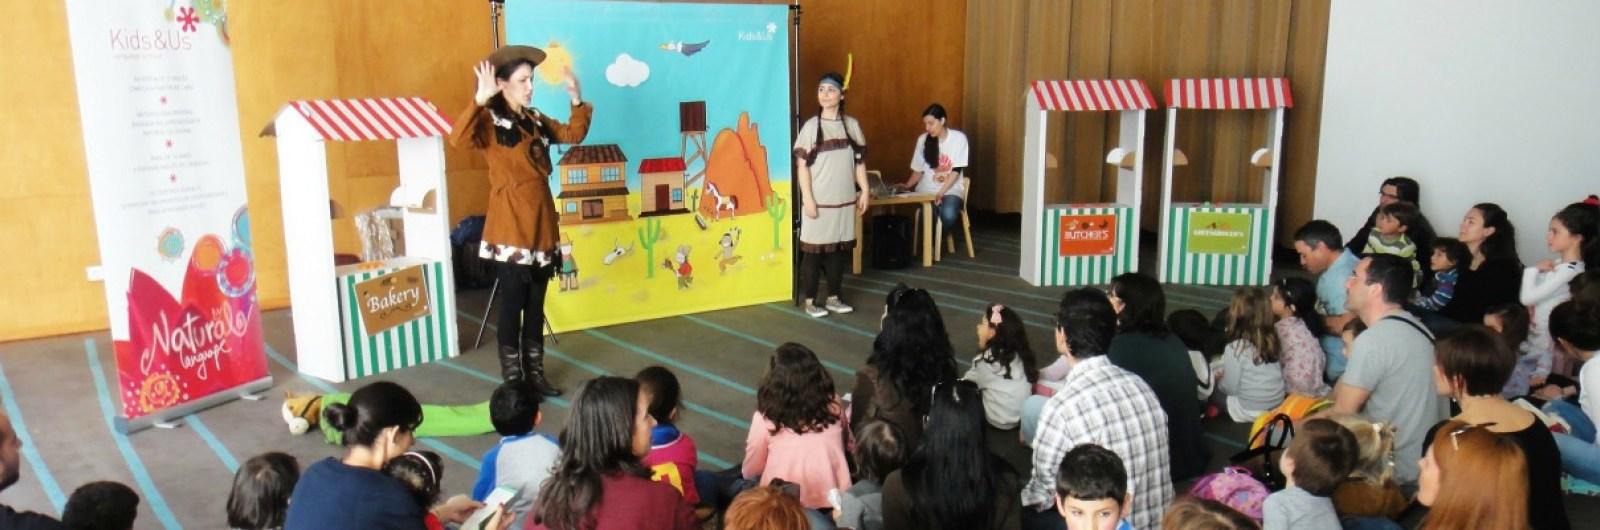 Kids&Us distinguida nos Pumpkin Awards